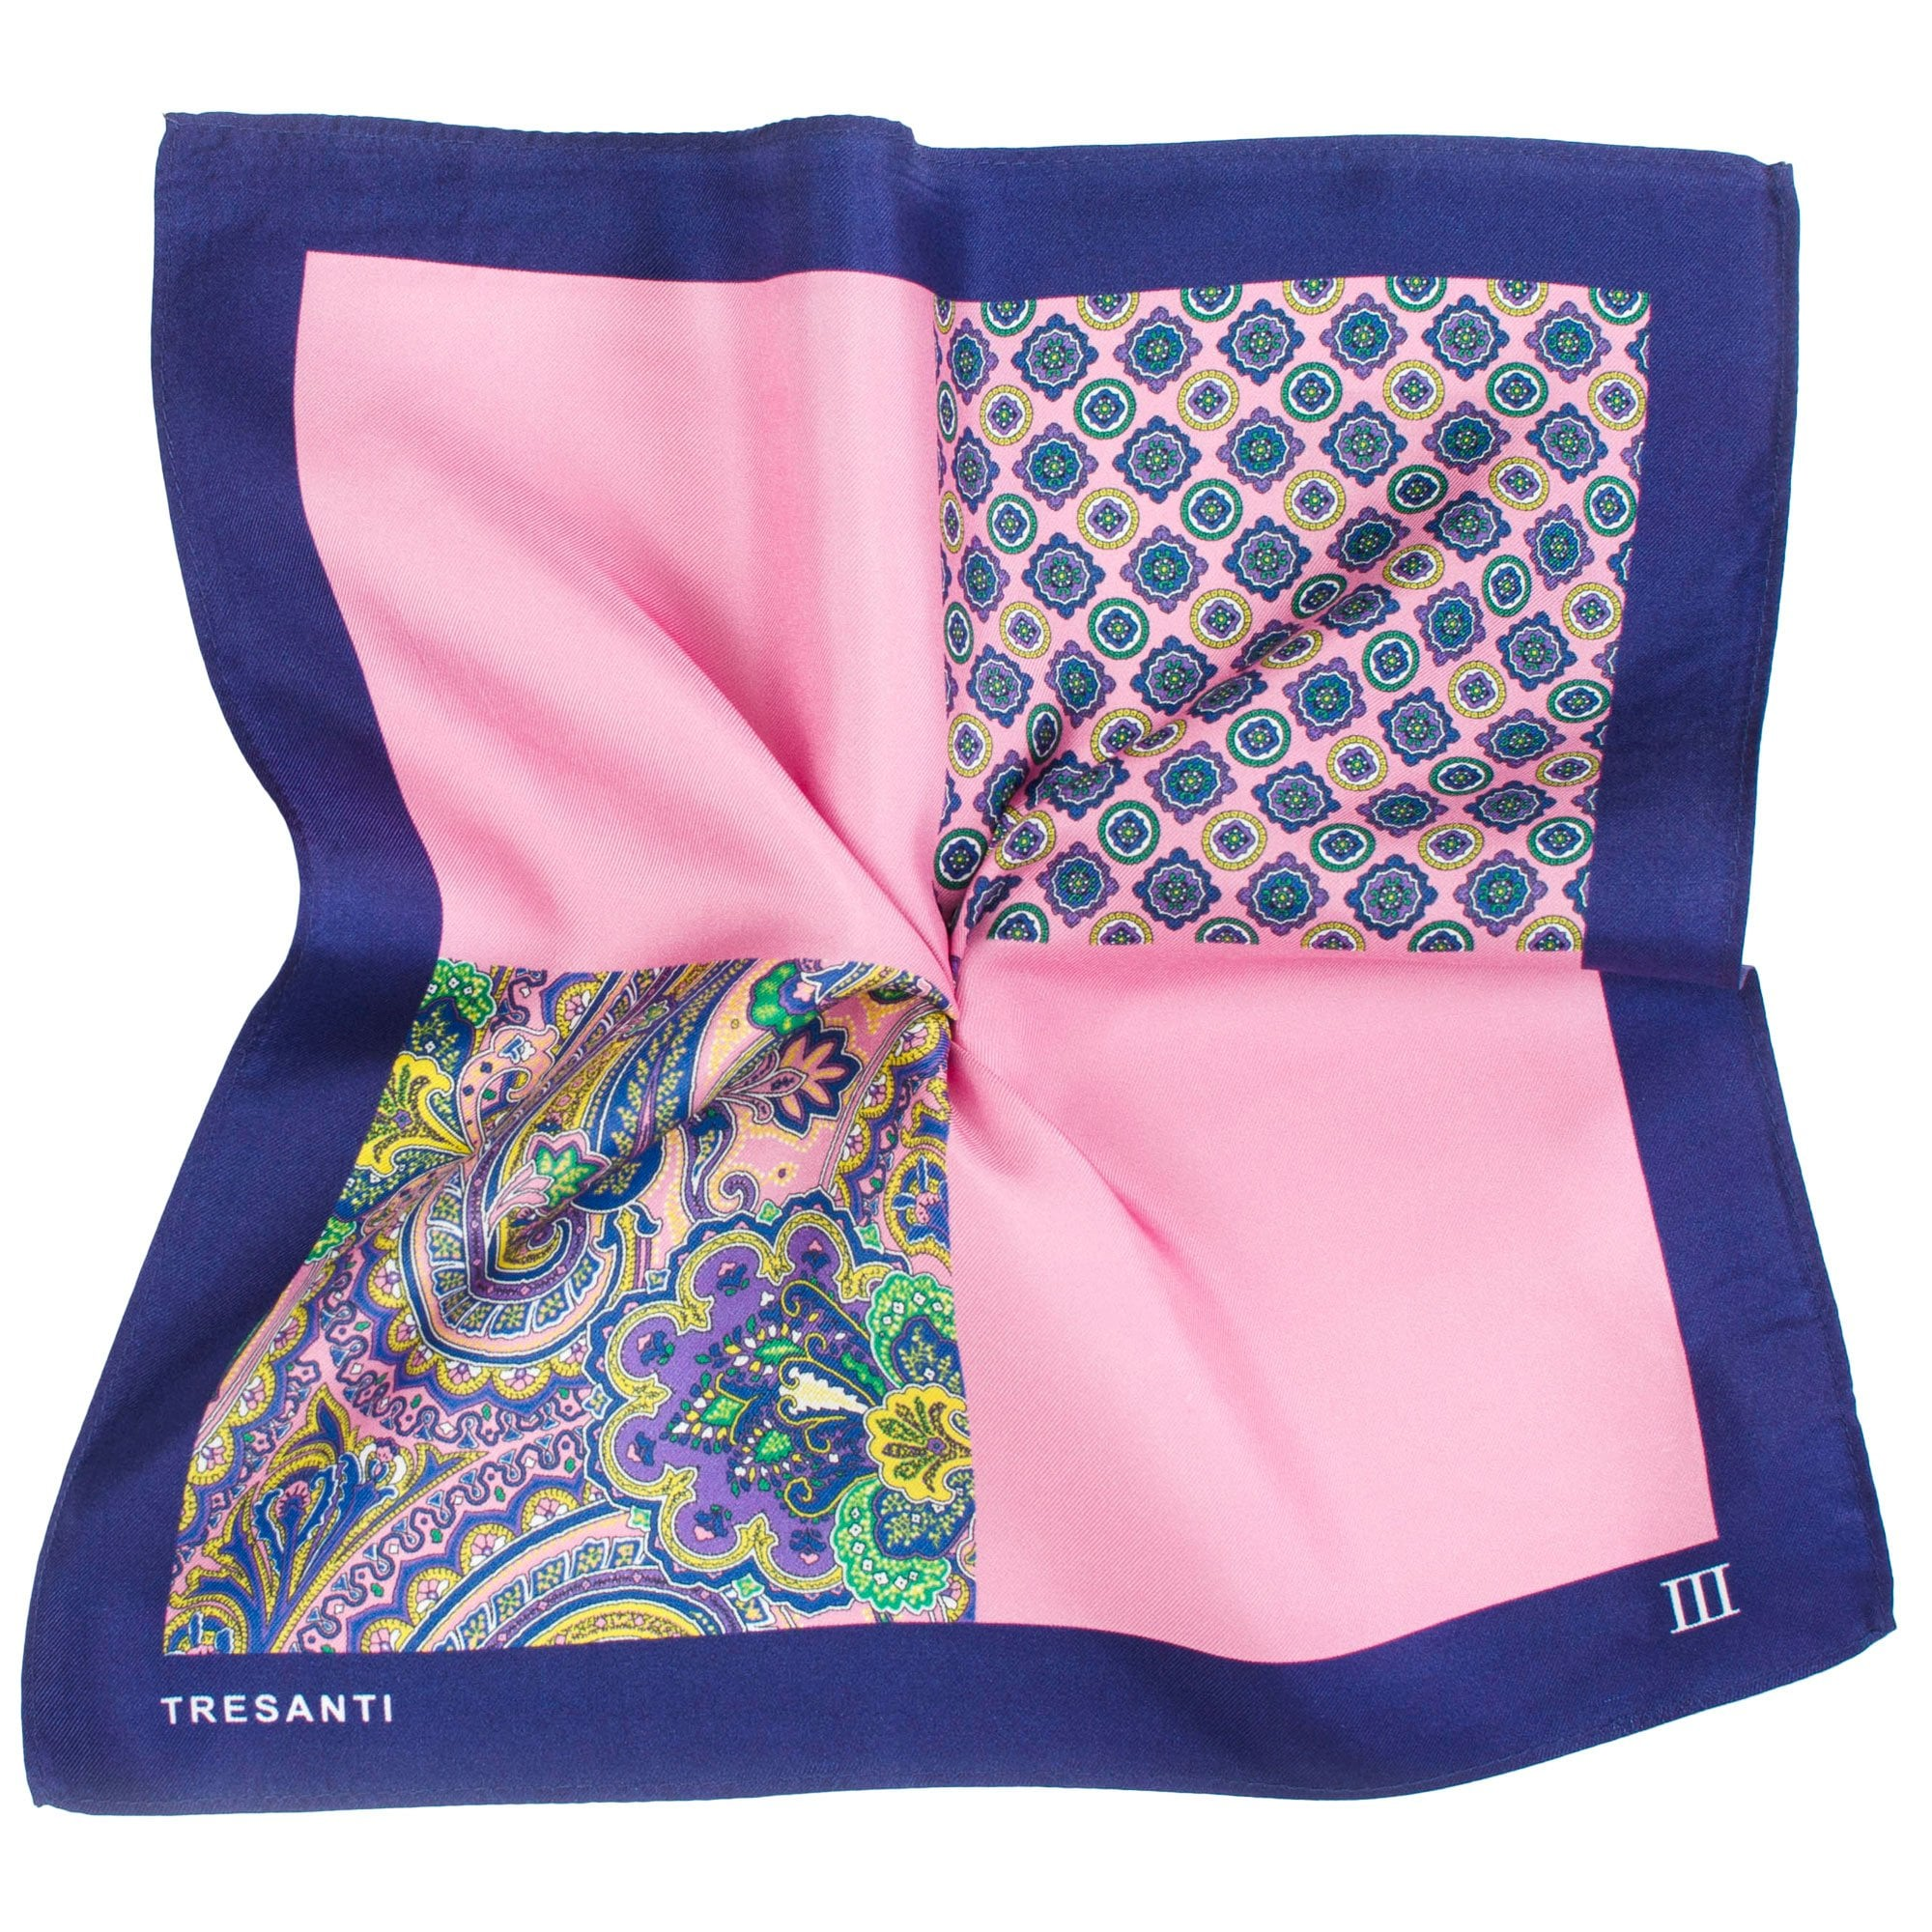 Hankie Pocket Square Handkerchief Silver Blue /& Pink Paisley